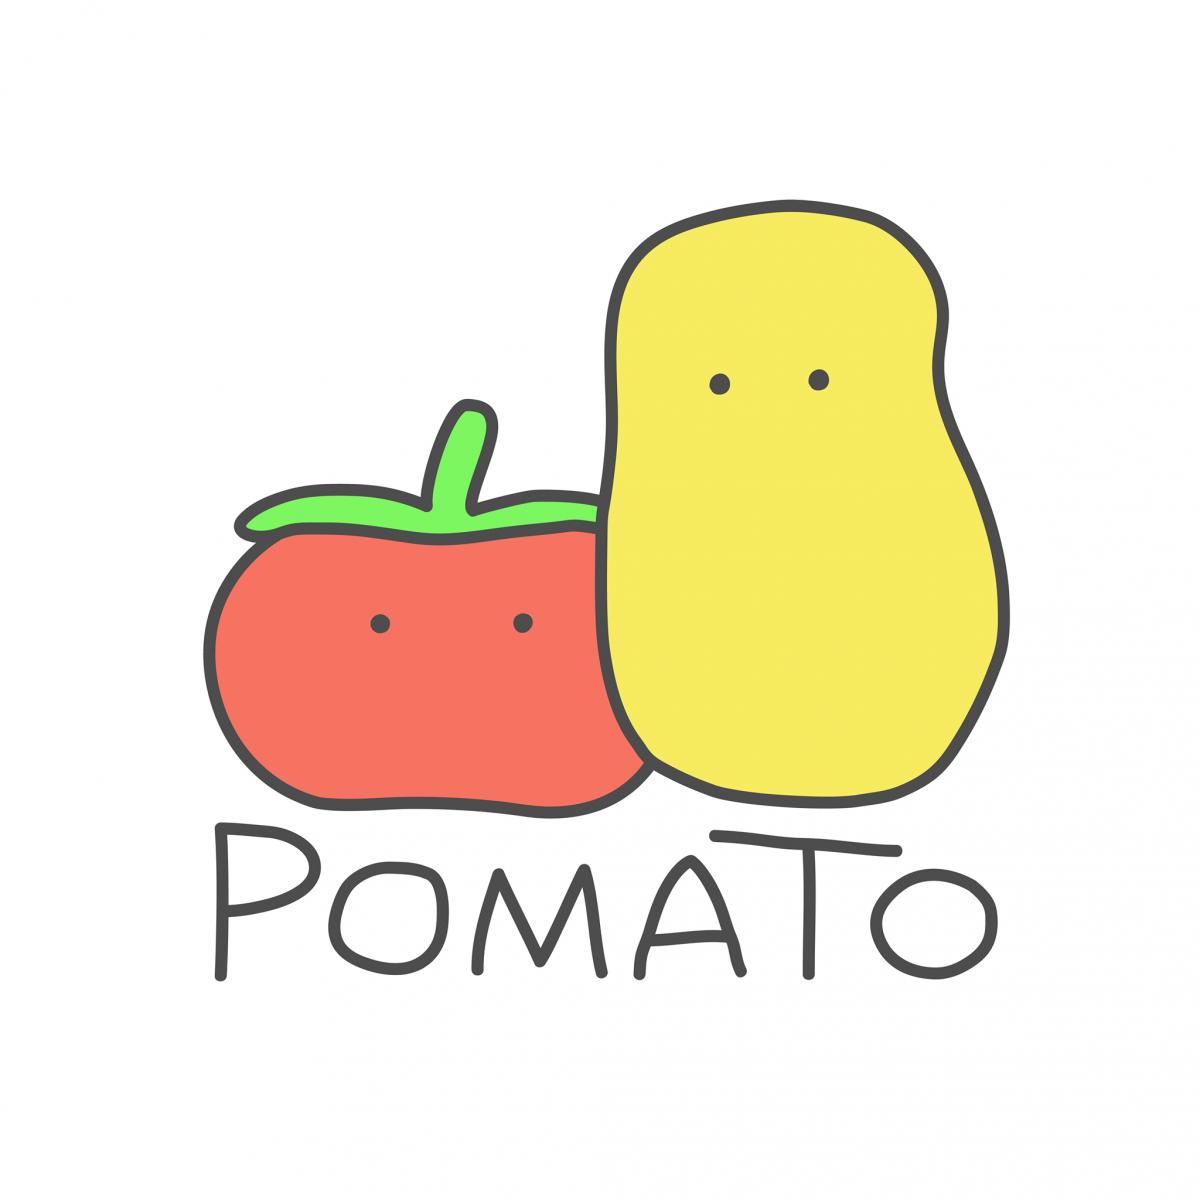 小薯茄 Pomato